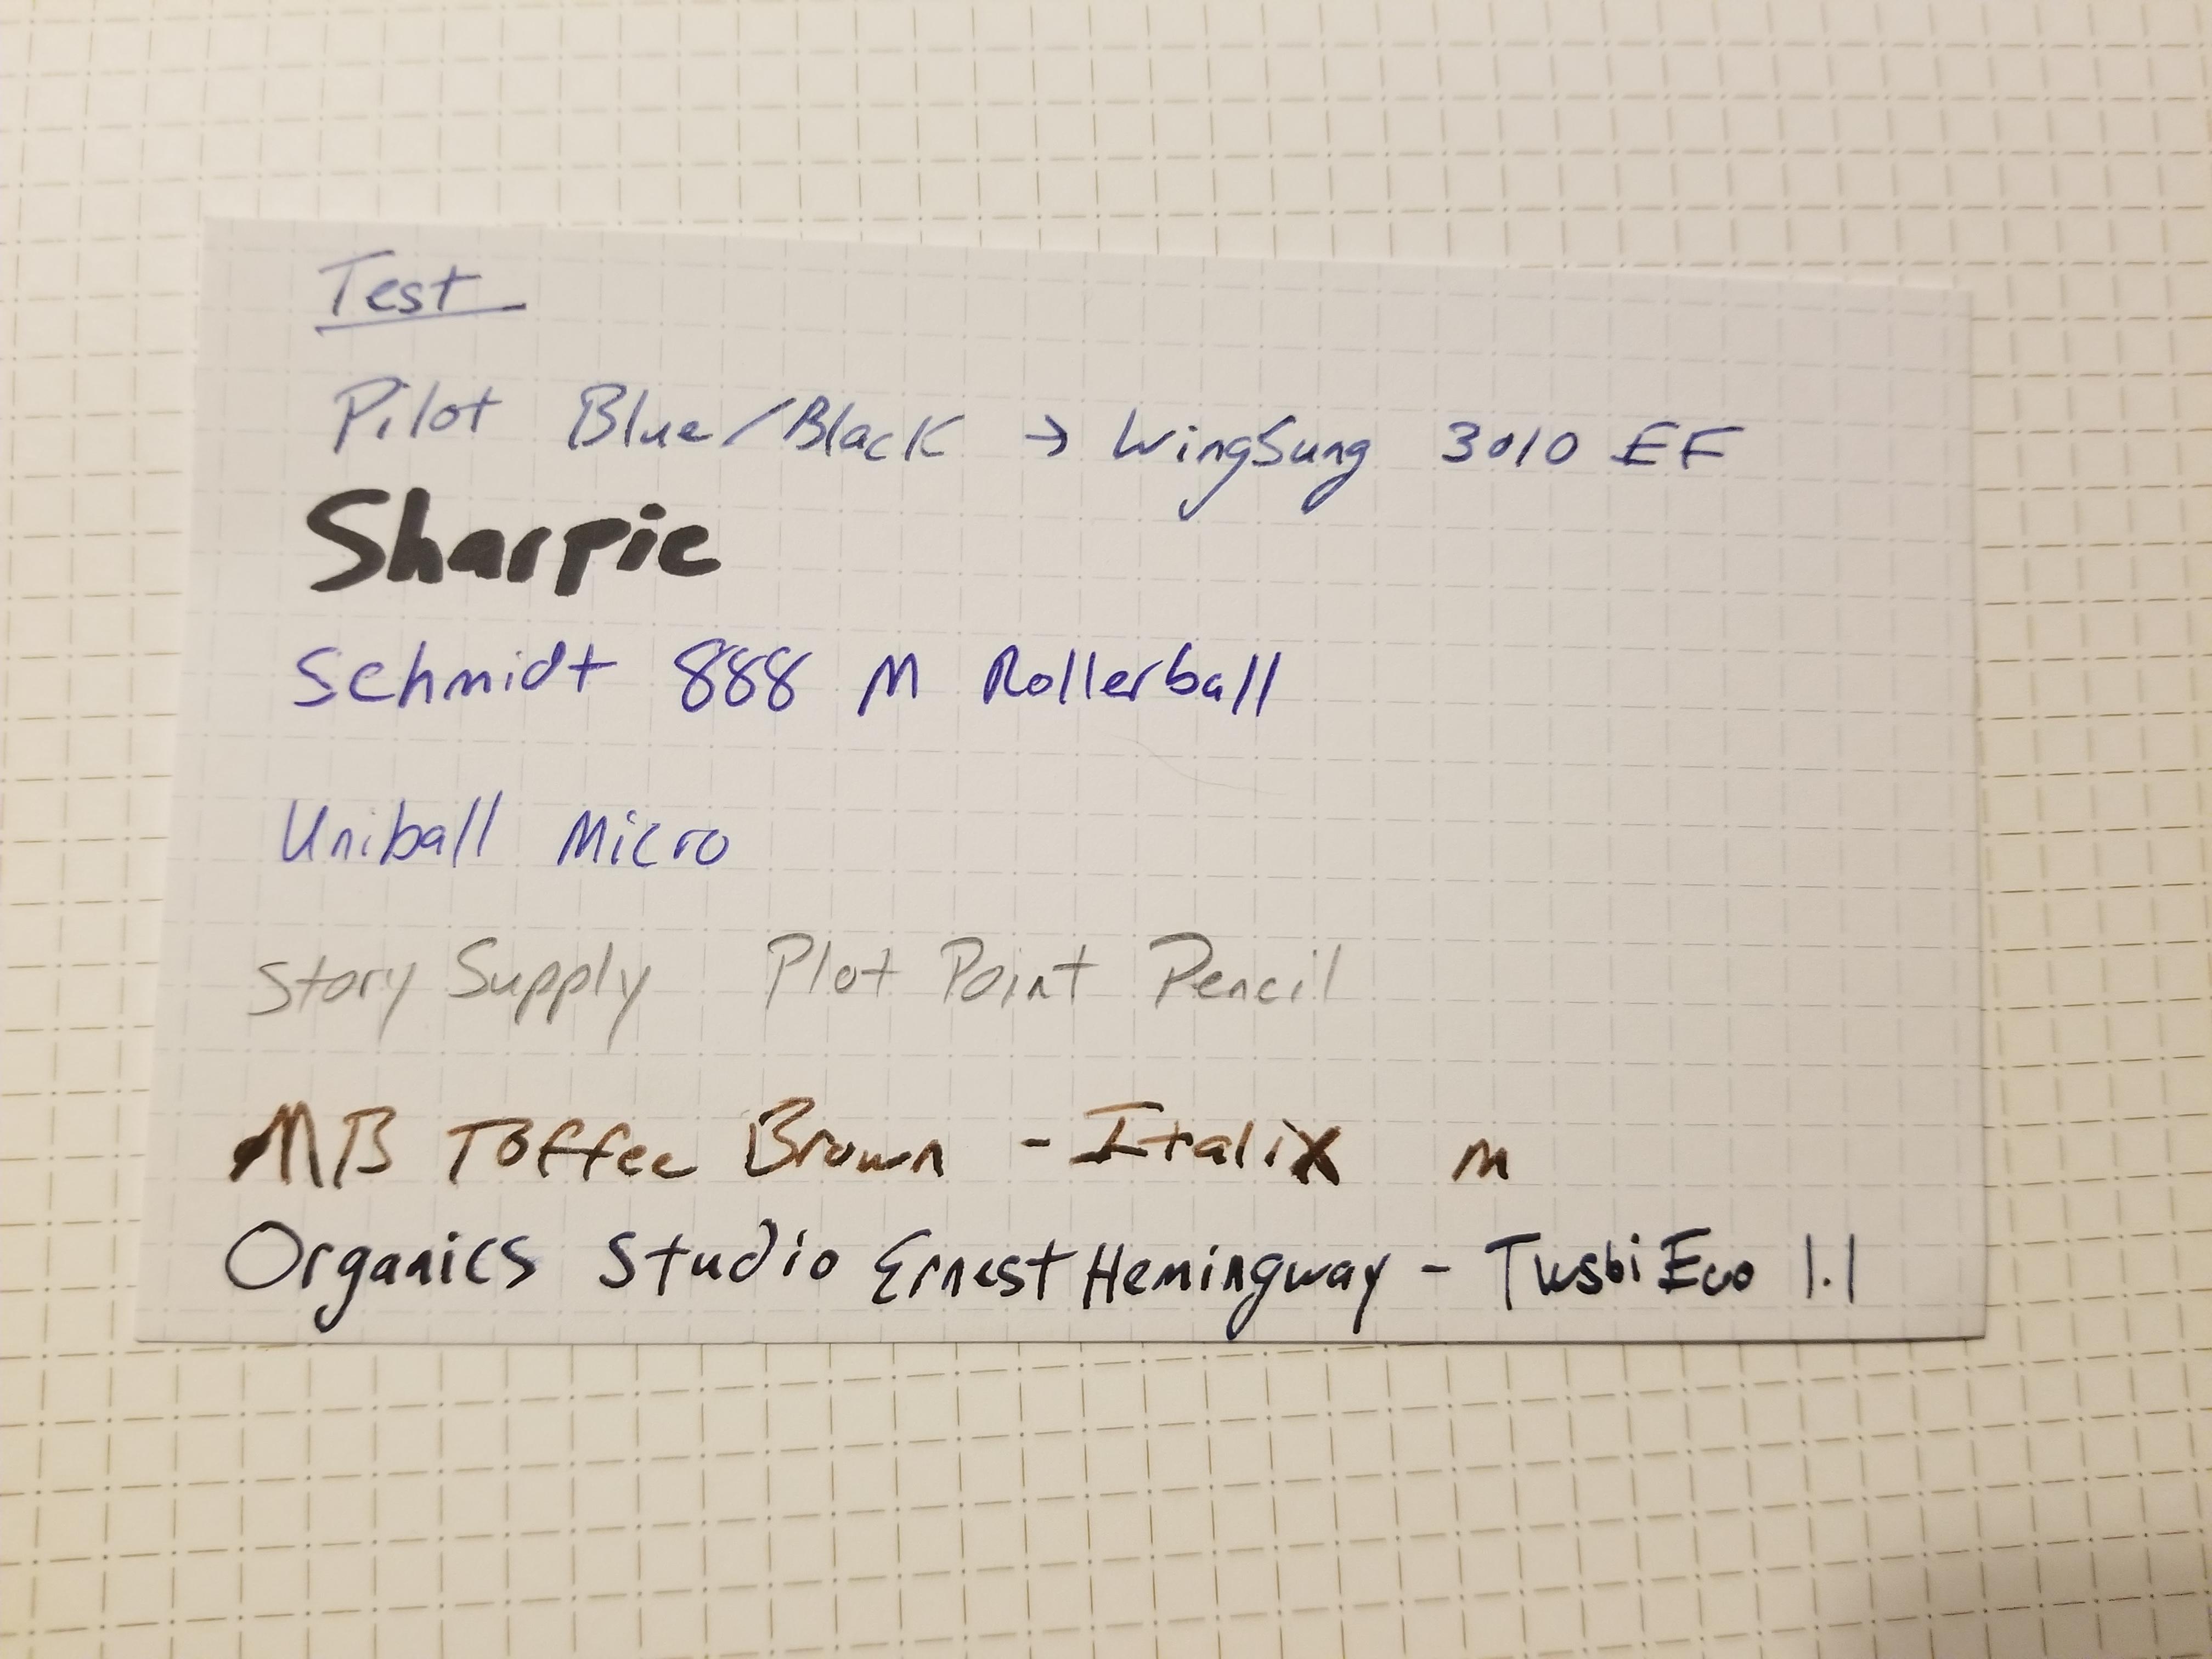 Nock Co Dotdash A5 Notebook And Notecards Pengeek13s Reviews Rollarball Fountain Pen Diagram B